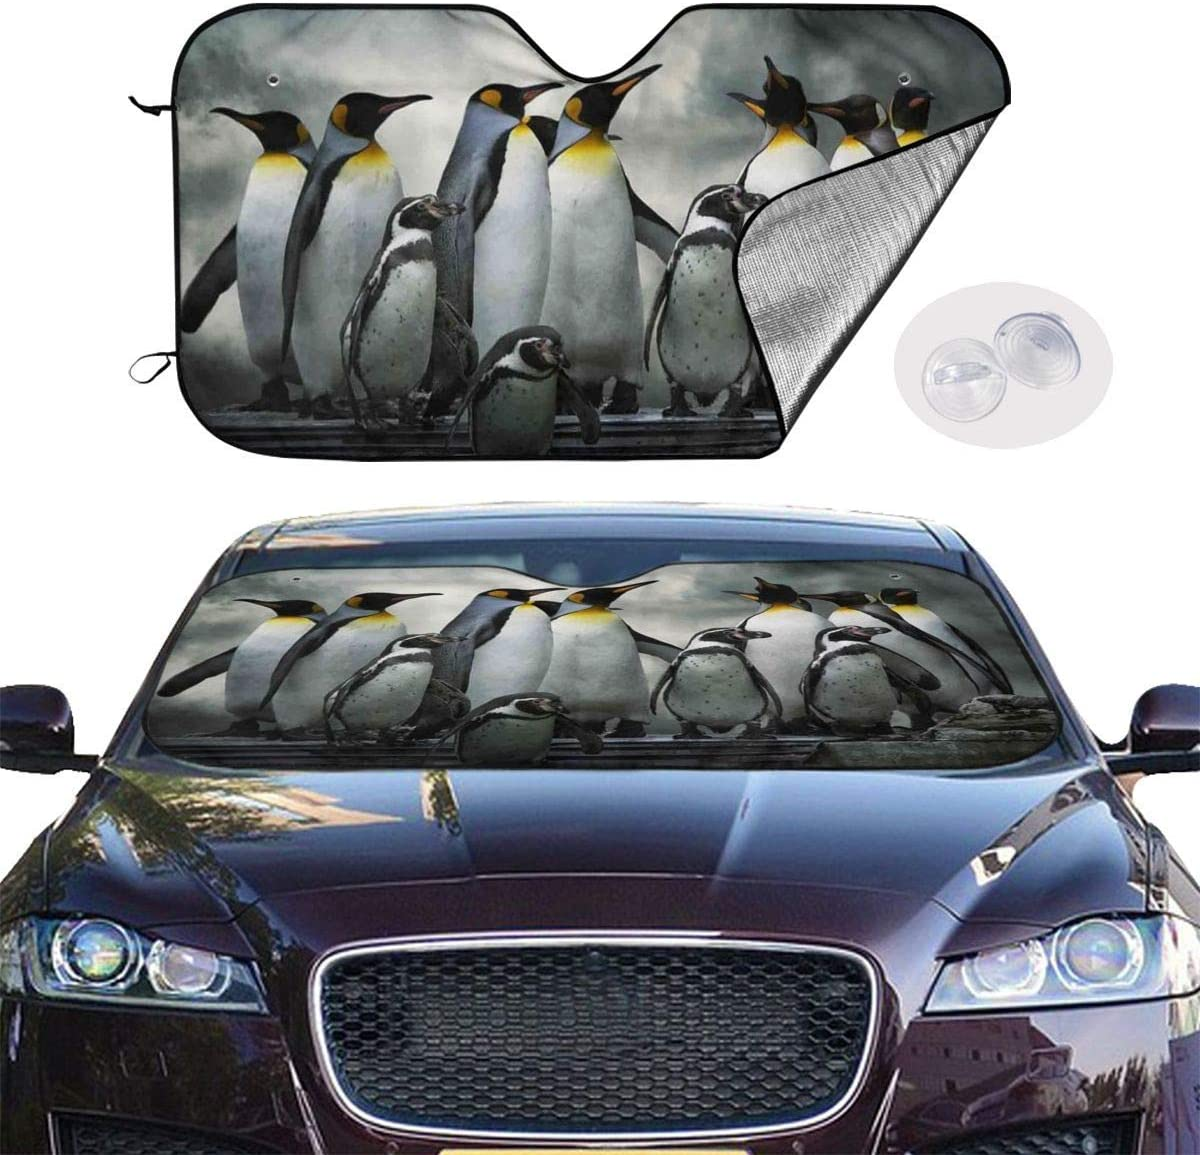 51.2 X 27.5 Kejbr Penguins Family Car Windshield Sun Shade Window Windscreen Cover Universal Fit Car UV Ray Sun and Heat Visor Protection